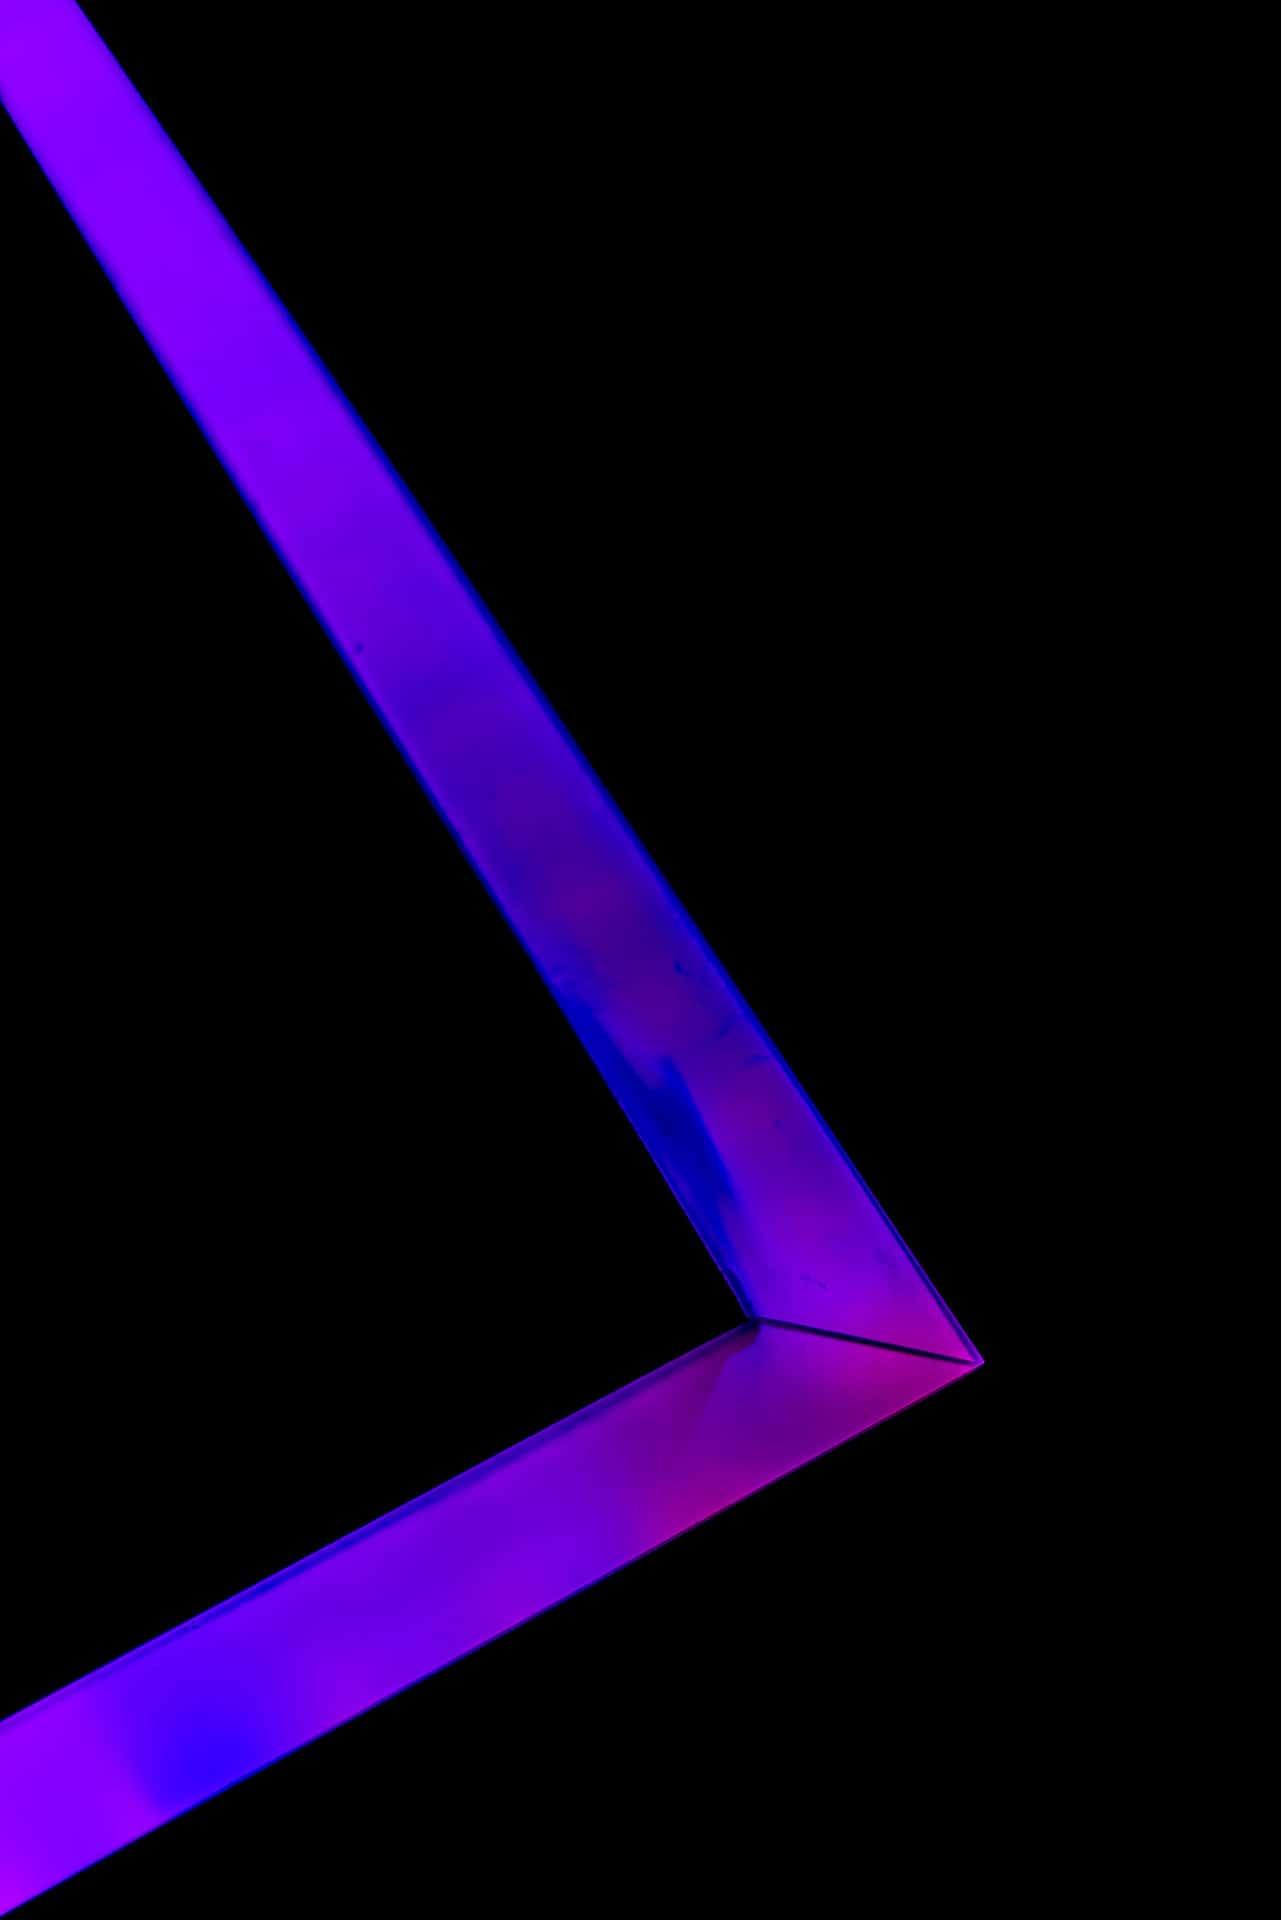 artnorama - Purple Hook